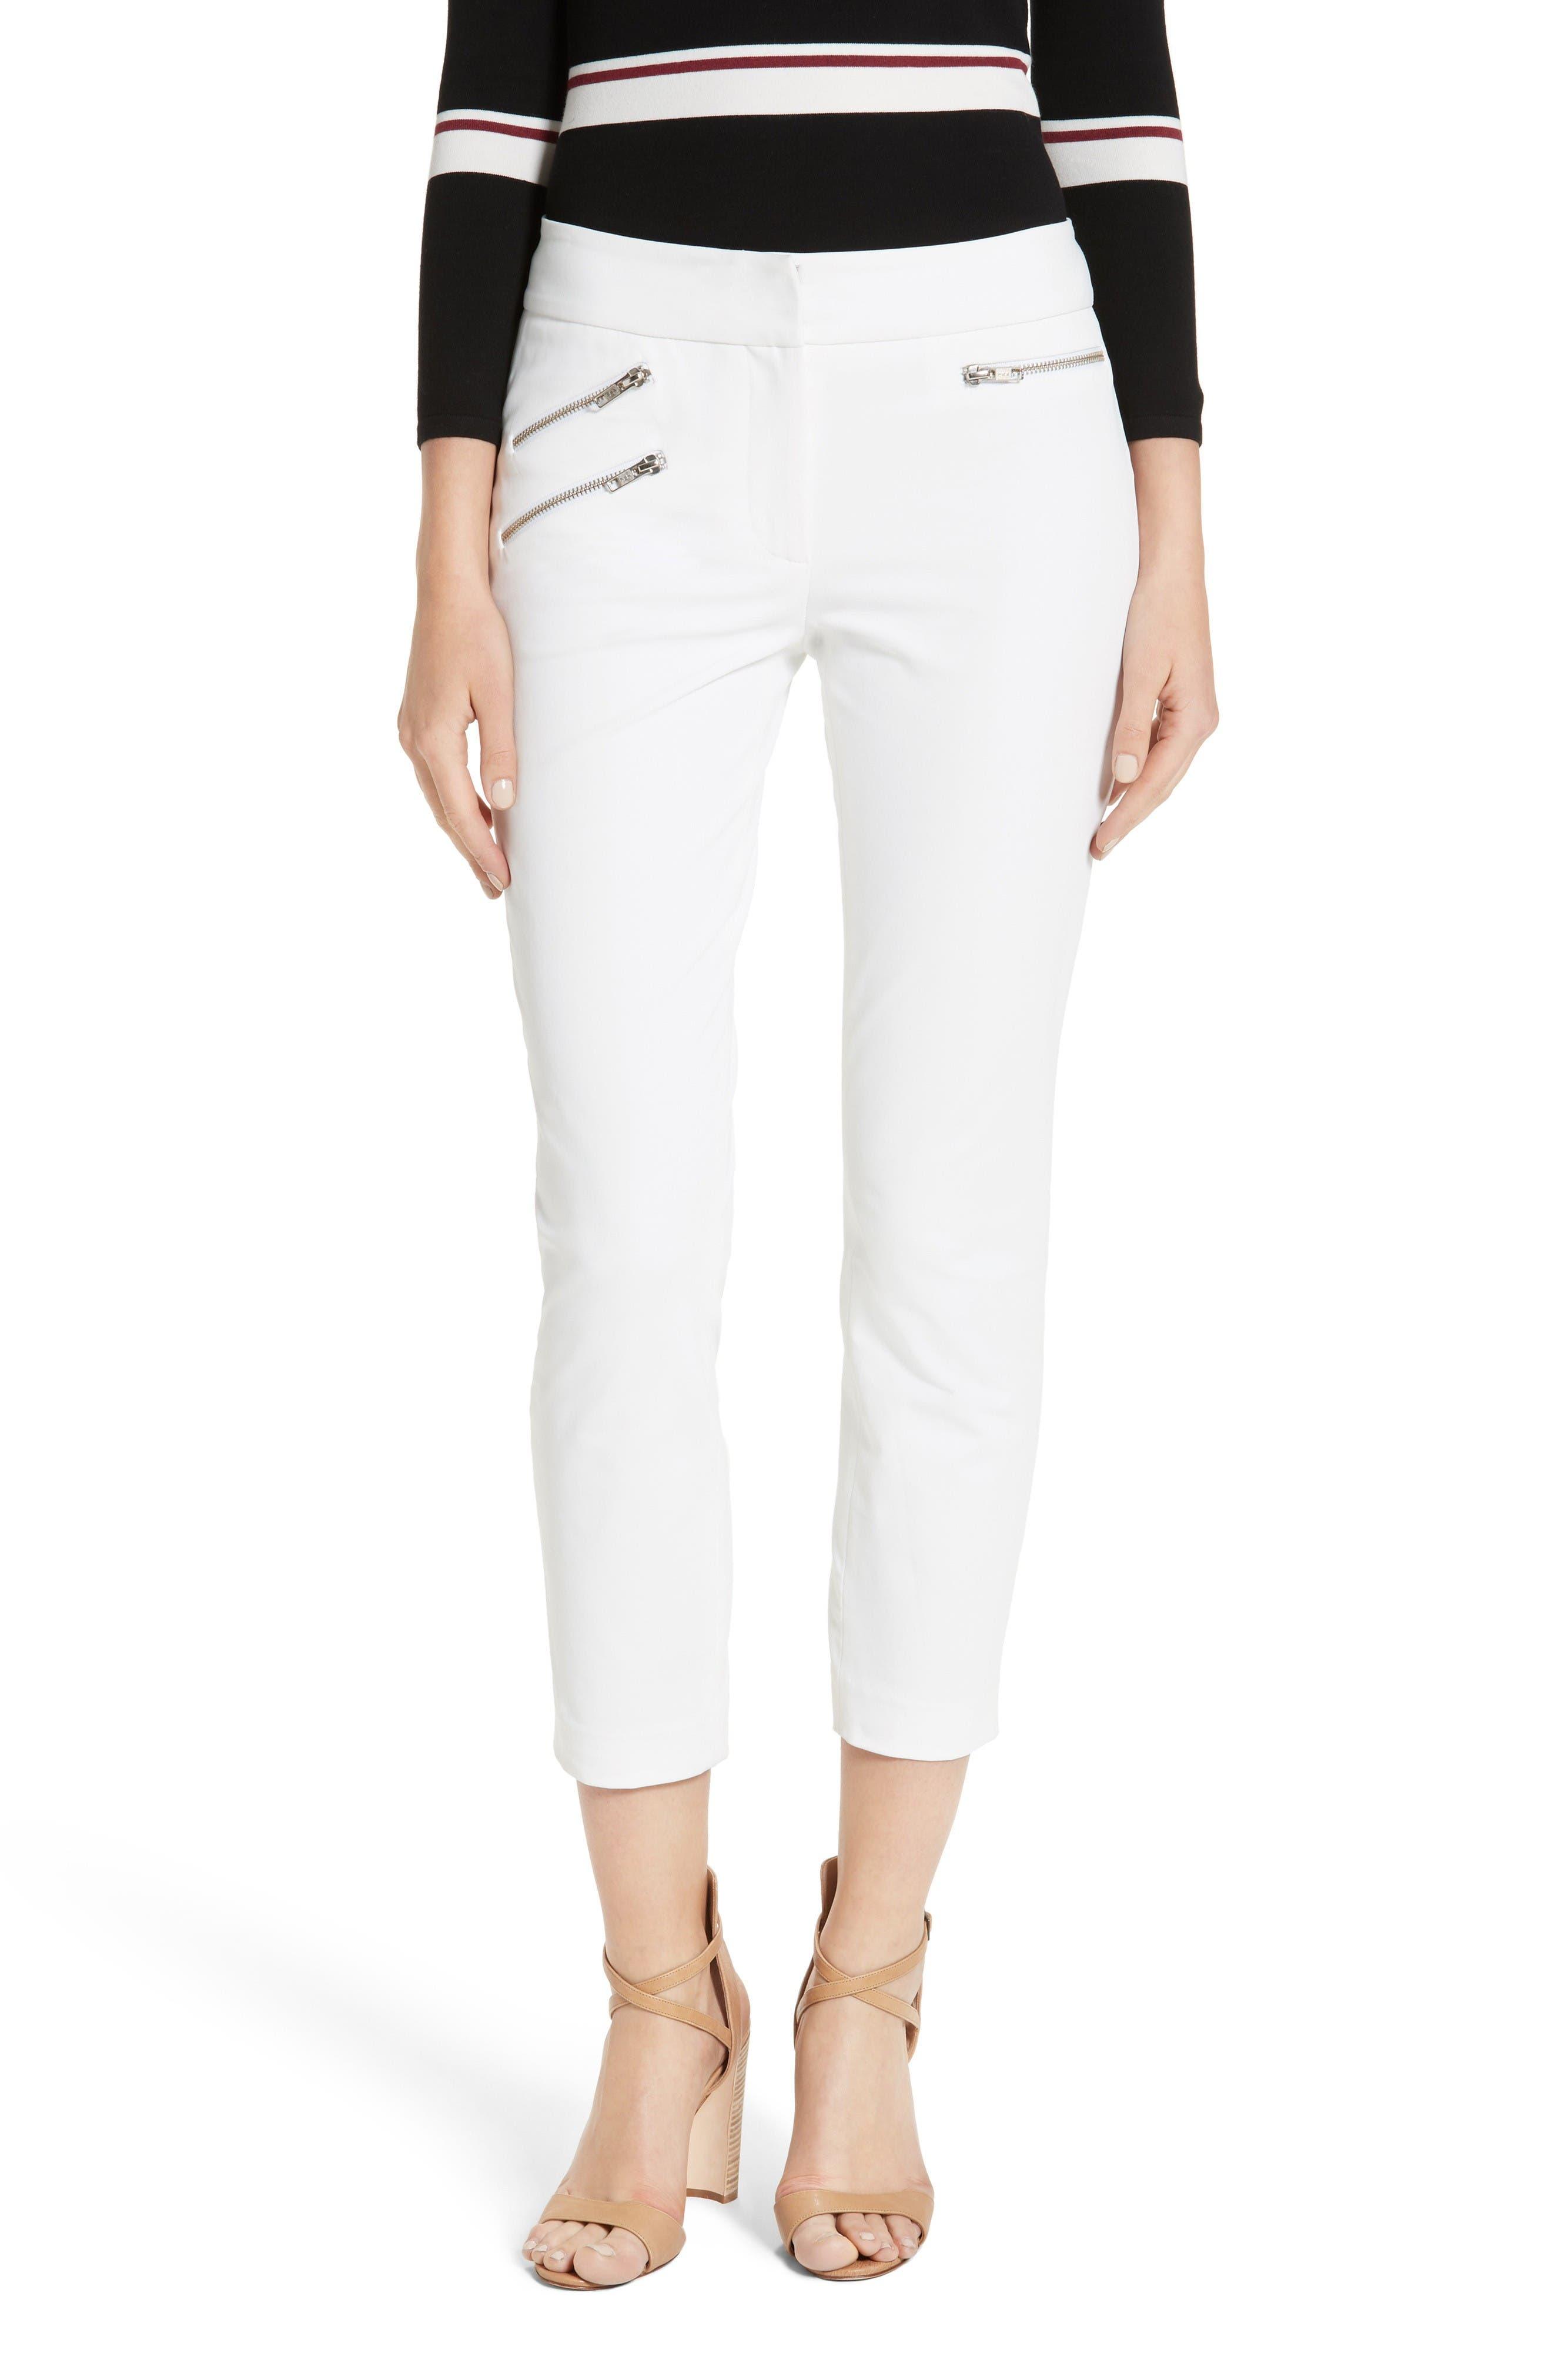 Veronica Beard Roxy Crop Pants